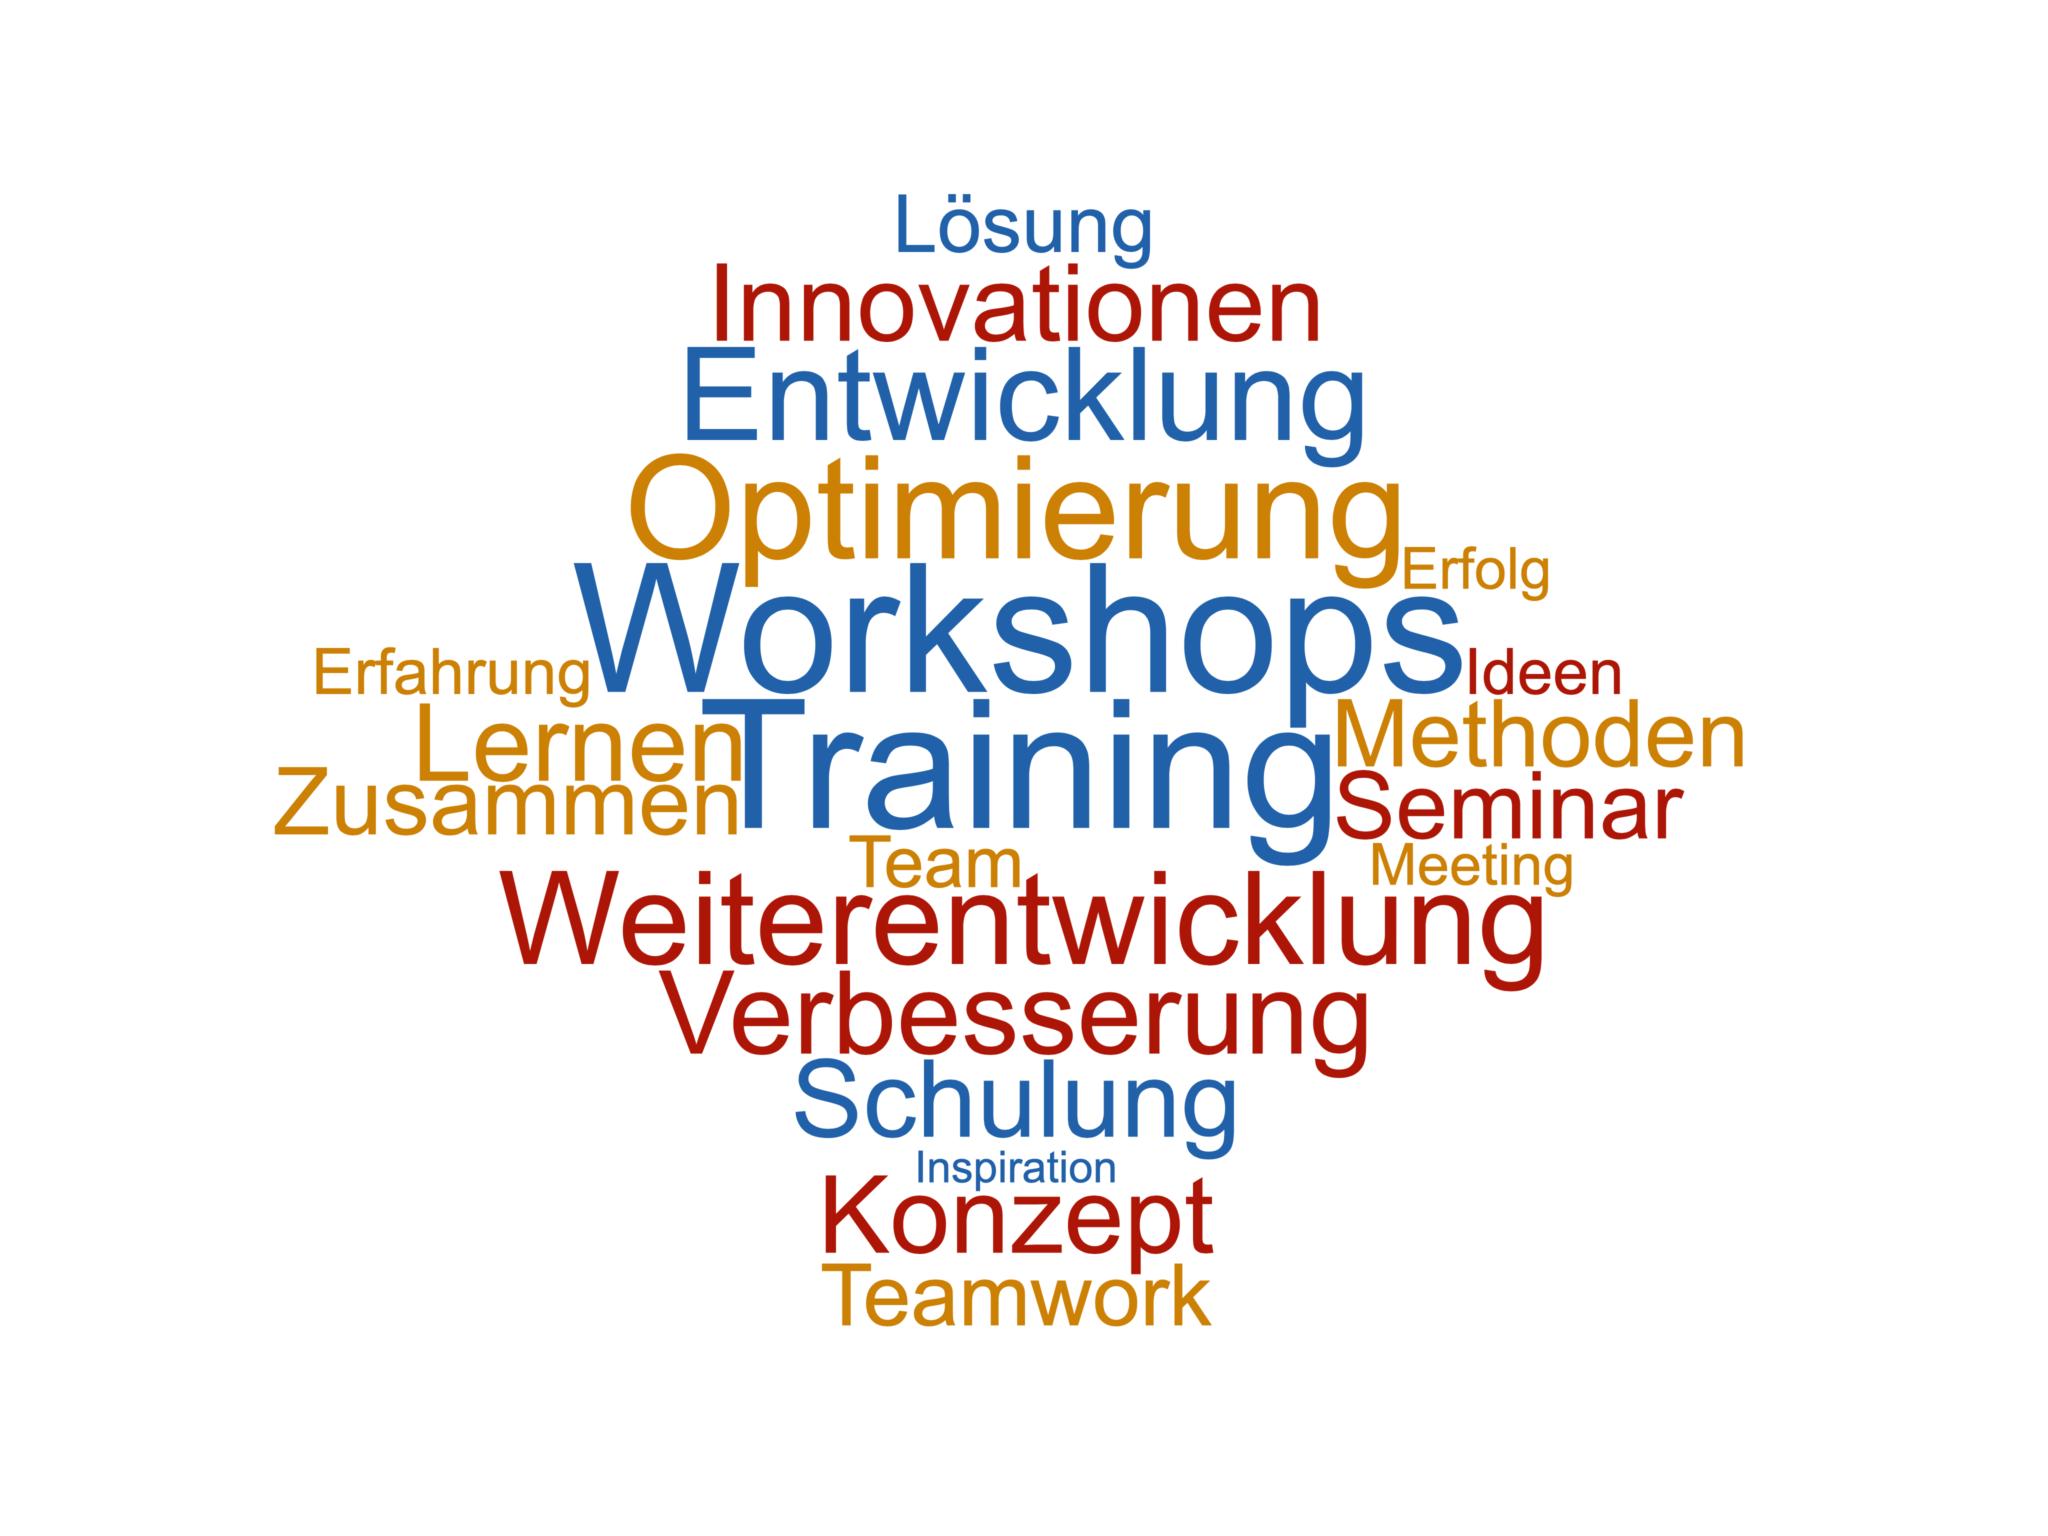 Training Workshops Team Innovationen Ideen Meeting Zusammen Teamwork Inspiration Erfolg Lösung Weiterentwicklung Entwicklung Konzept Lernen Verbesserung Optimierung Seminar Erfahrung Methoden Schulung